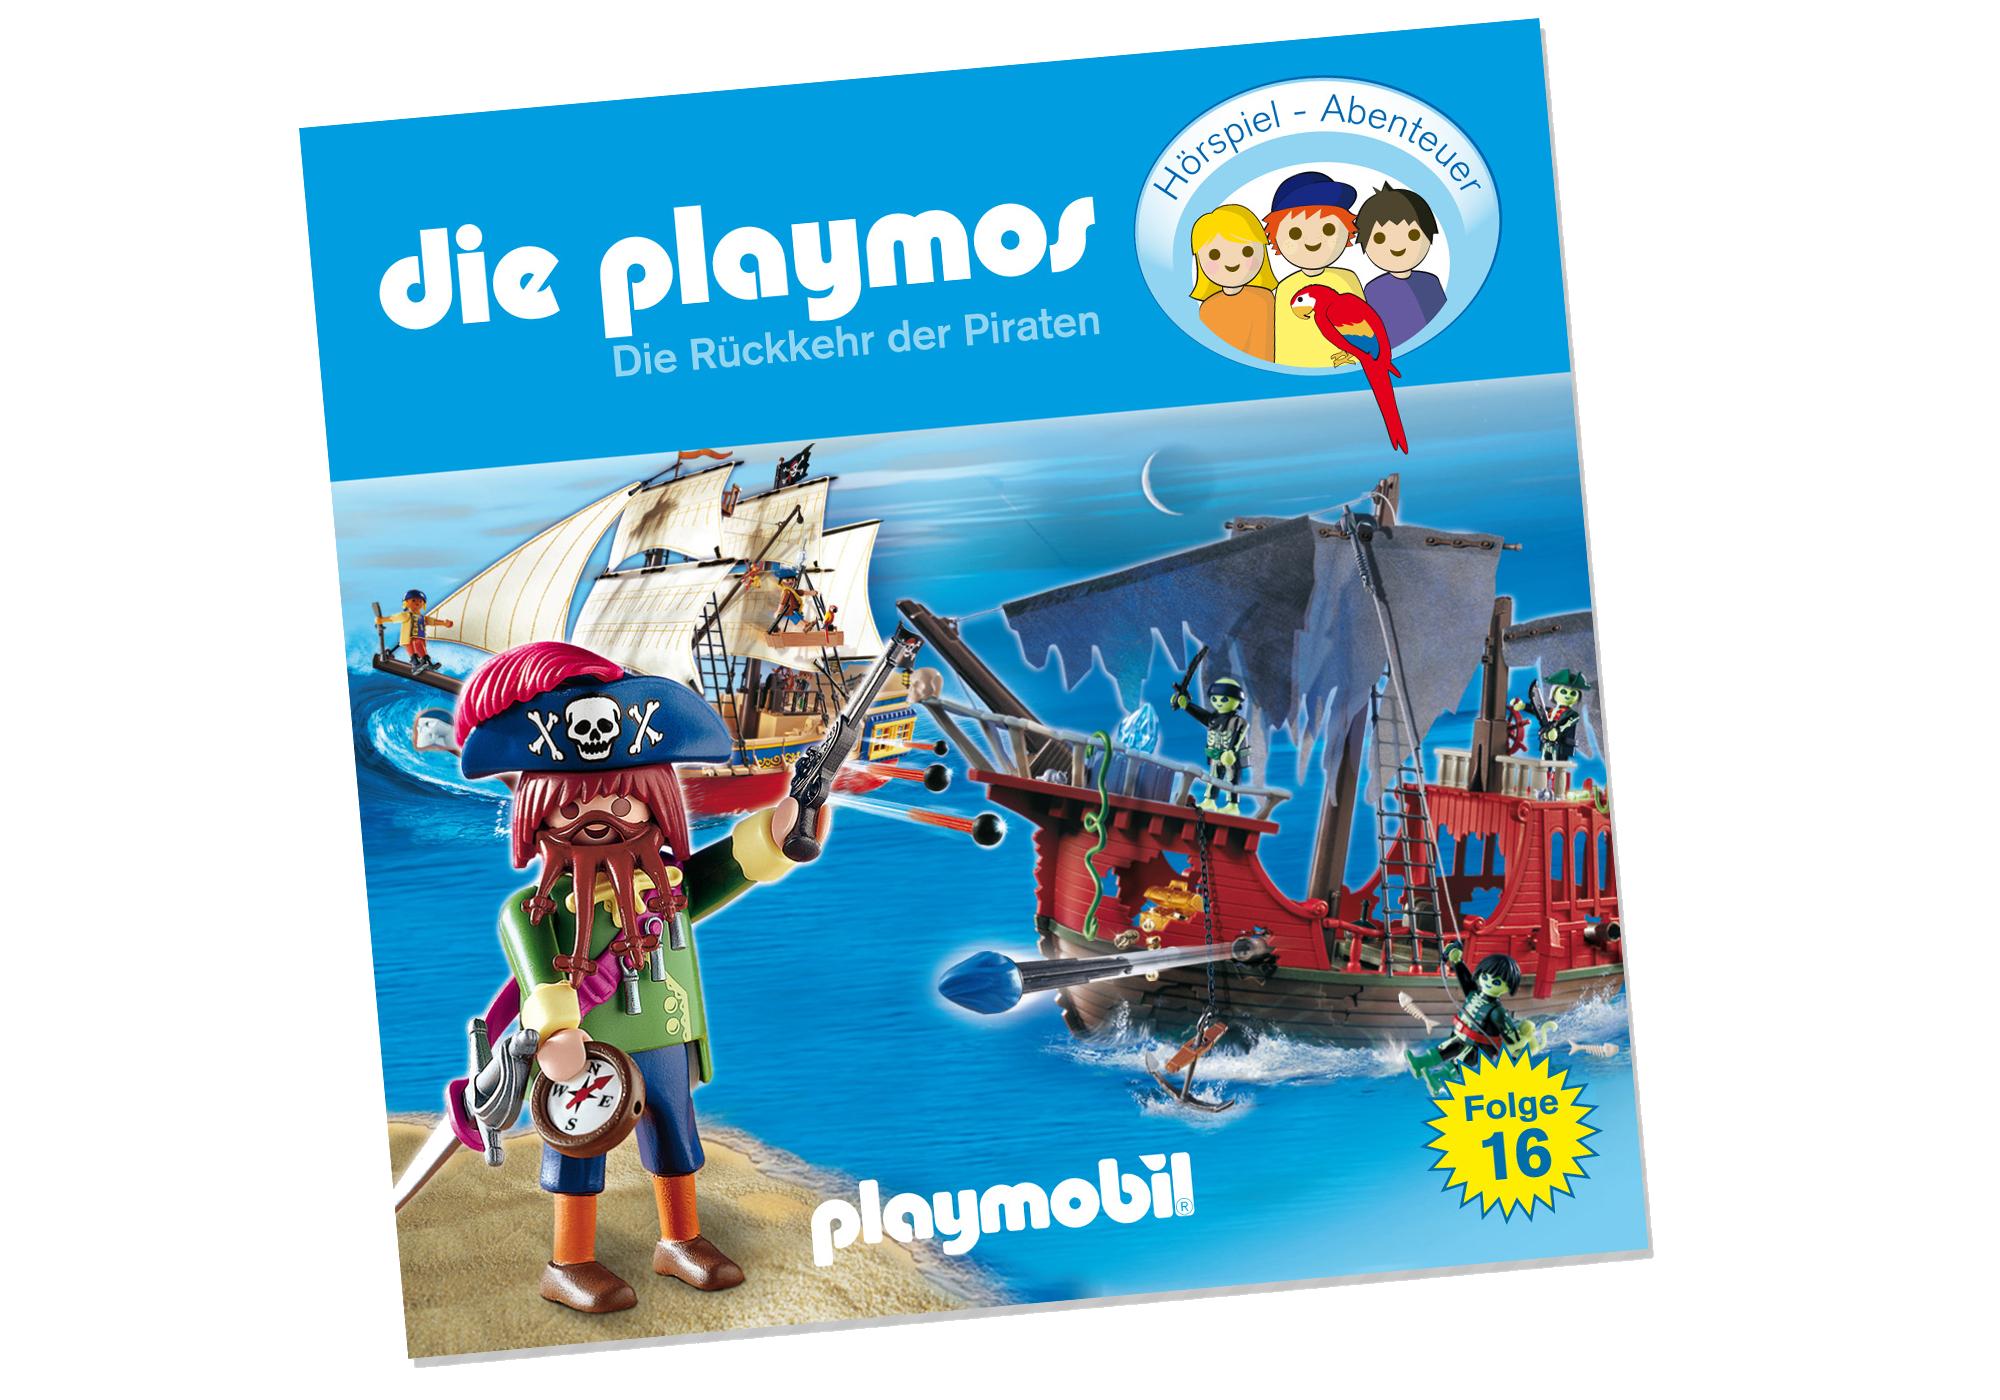 http://media.playmobil.com/i/playmobil/80262_product_detail